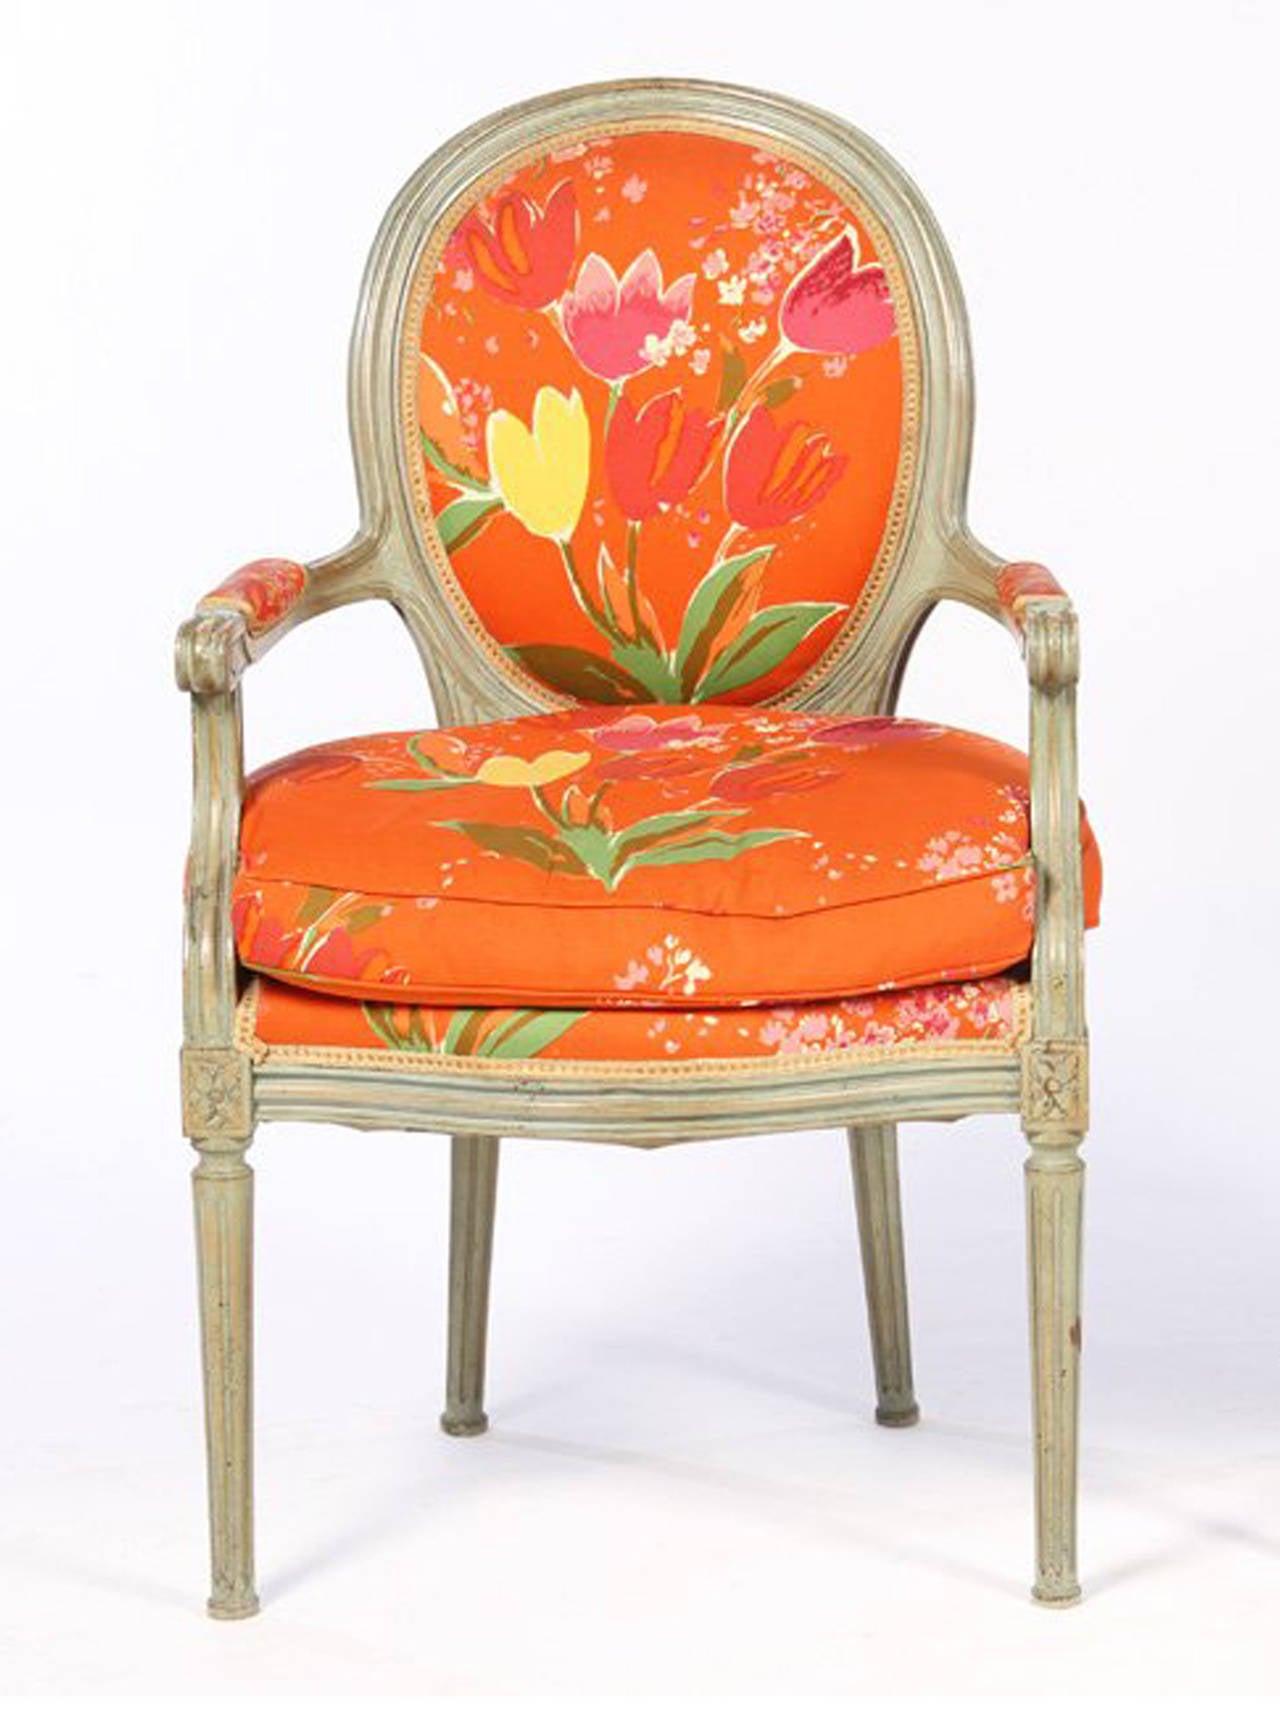 Pair Of Louis Xvi Style Fauteuils Paule Marrot Fabric